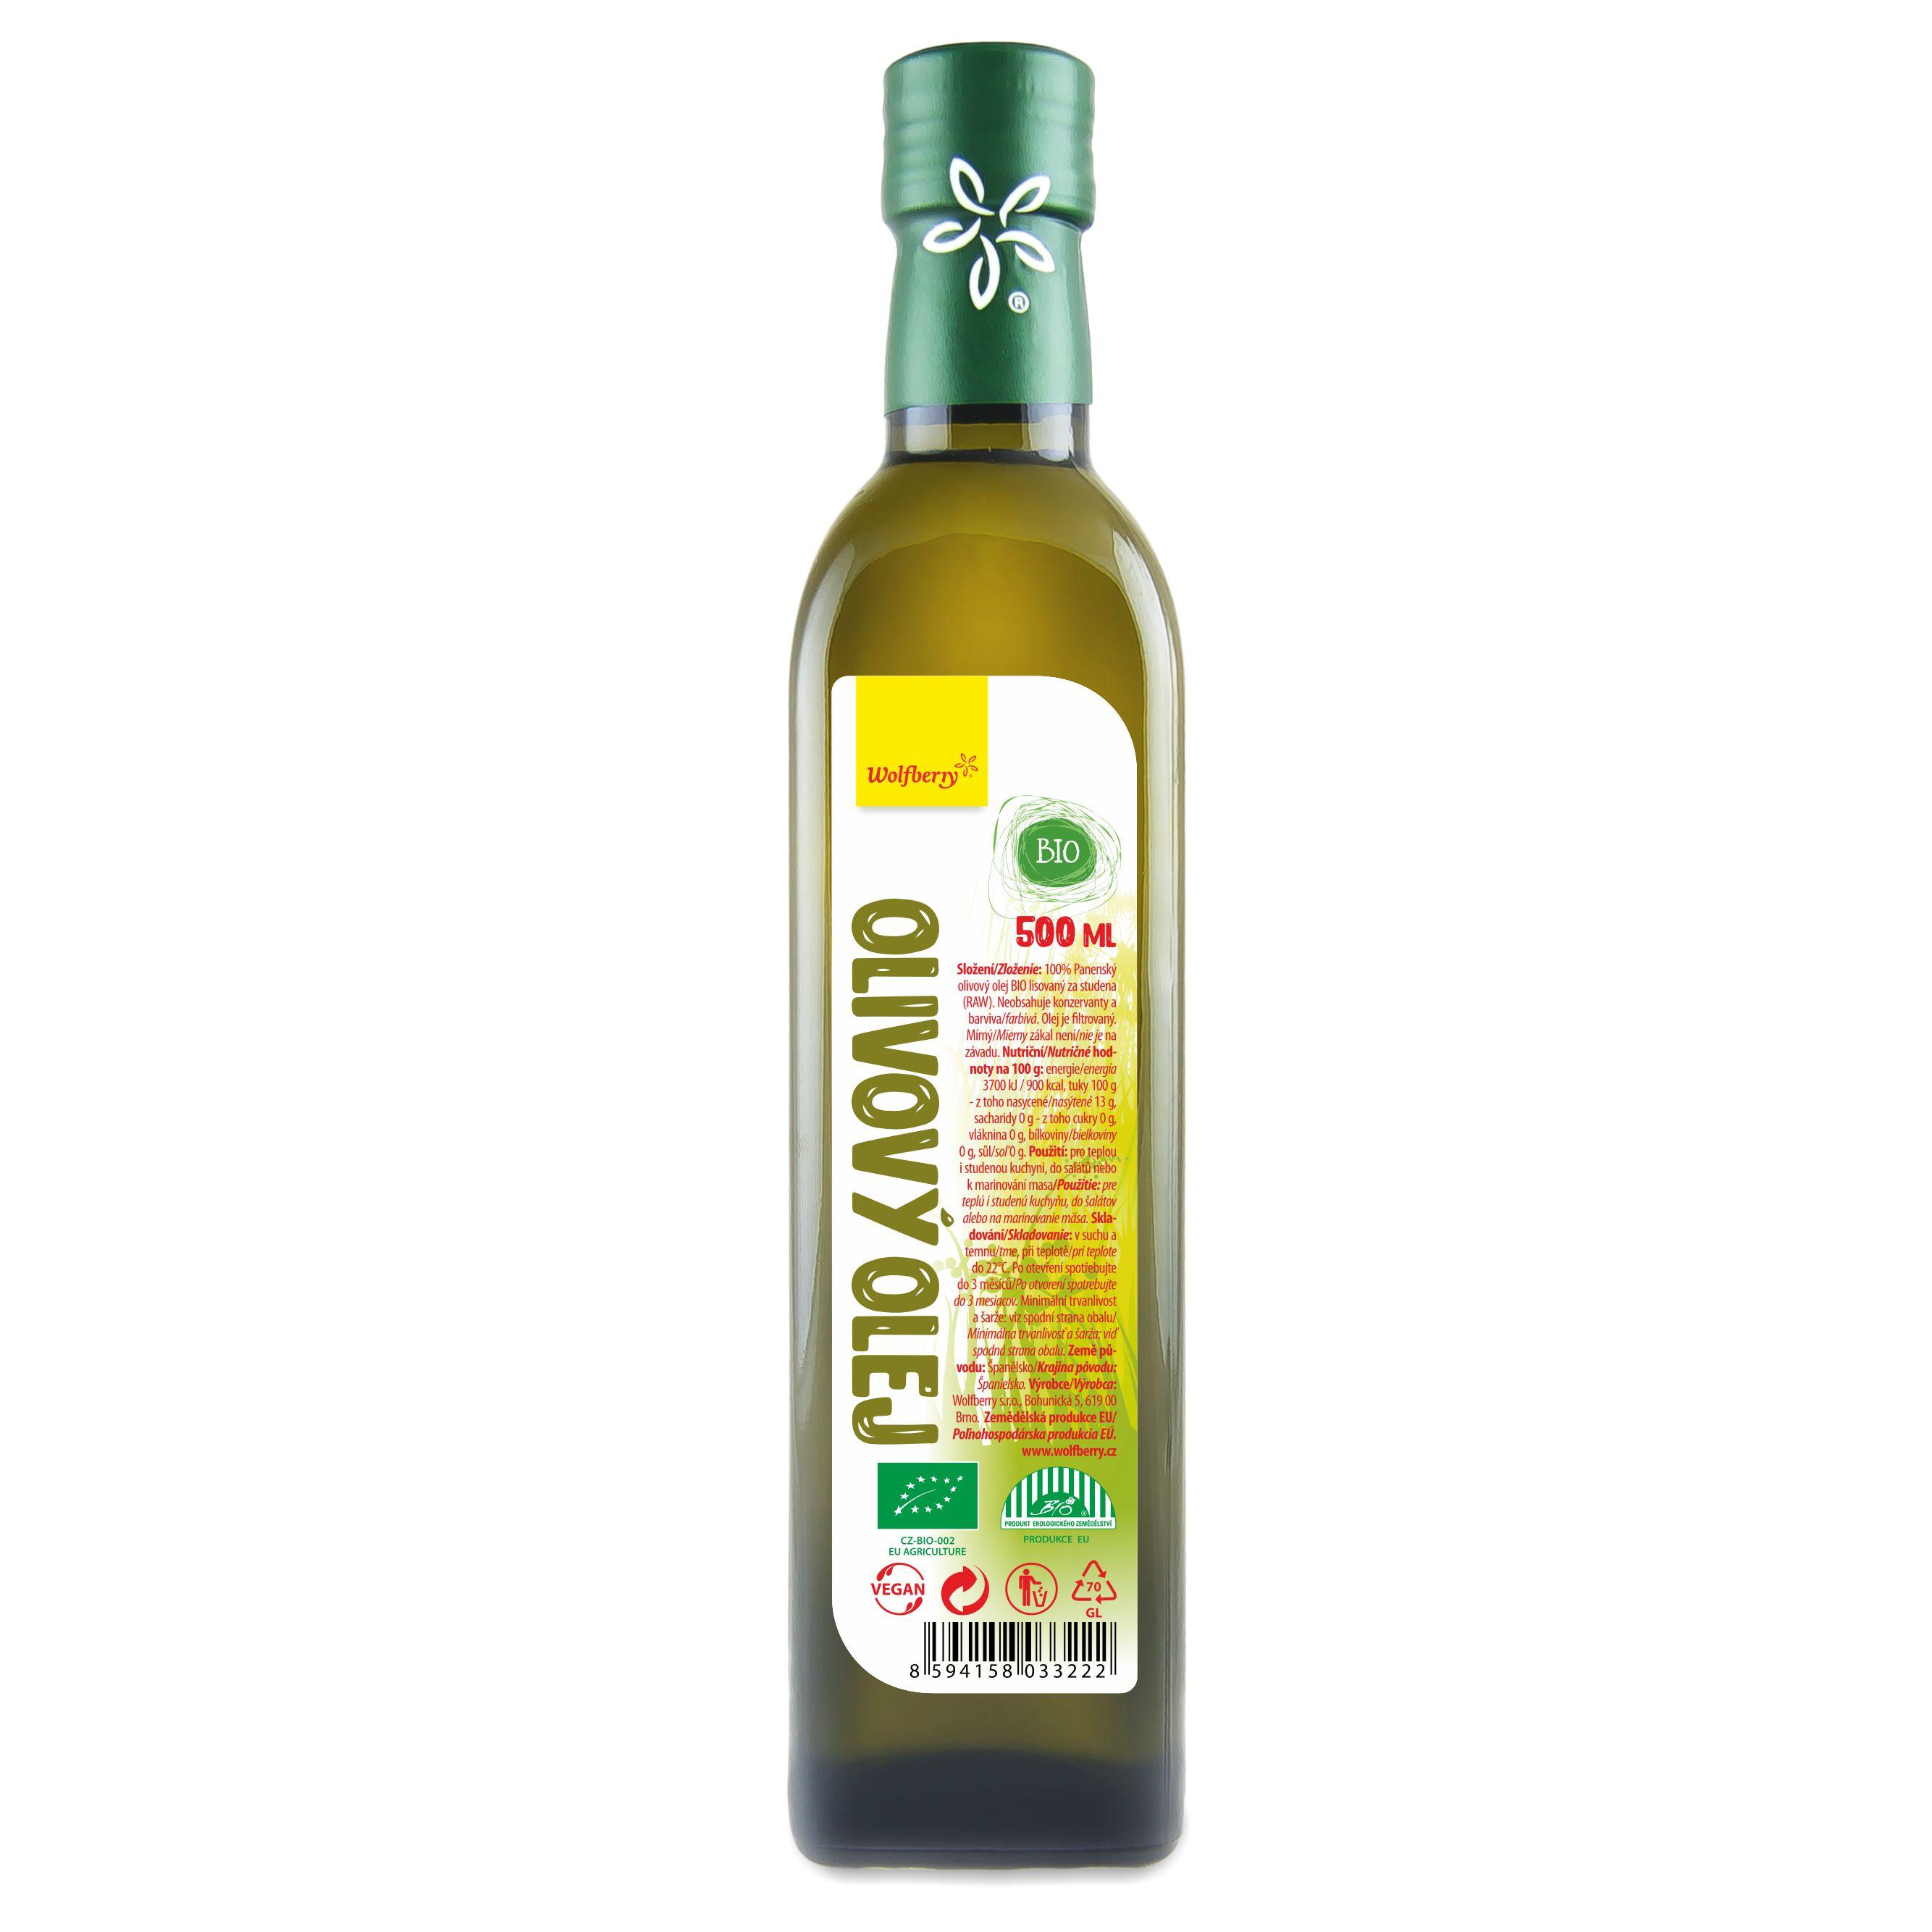 Wolfberry Olivový olej panenský BIO 500 ml Wolfberry * 500ml